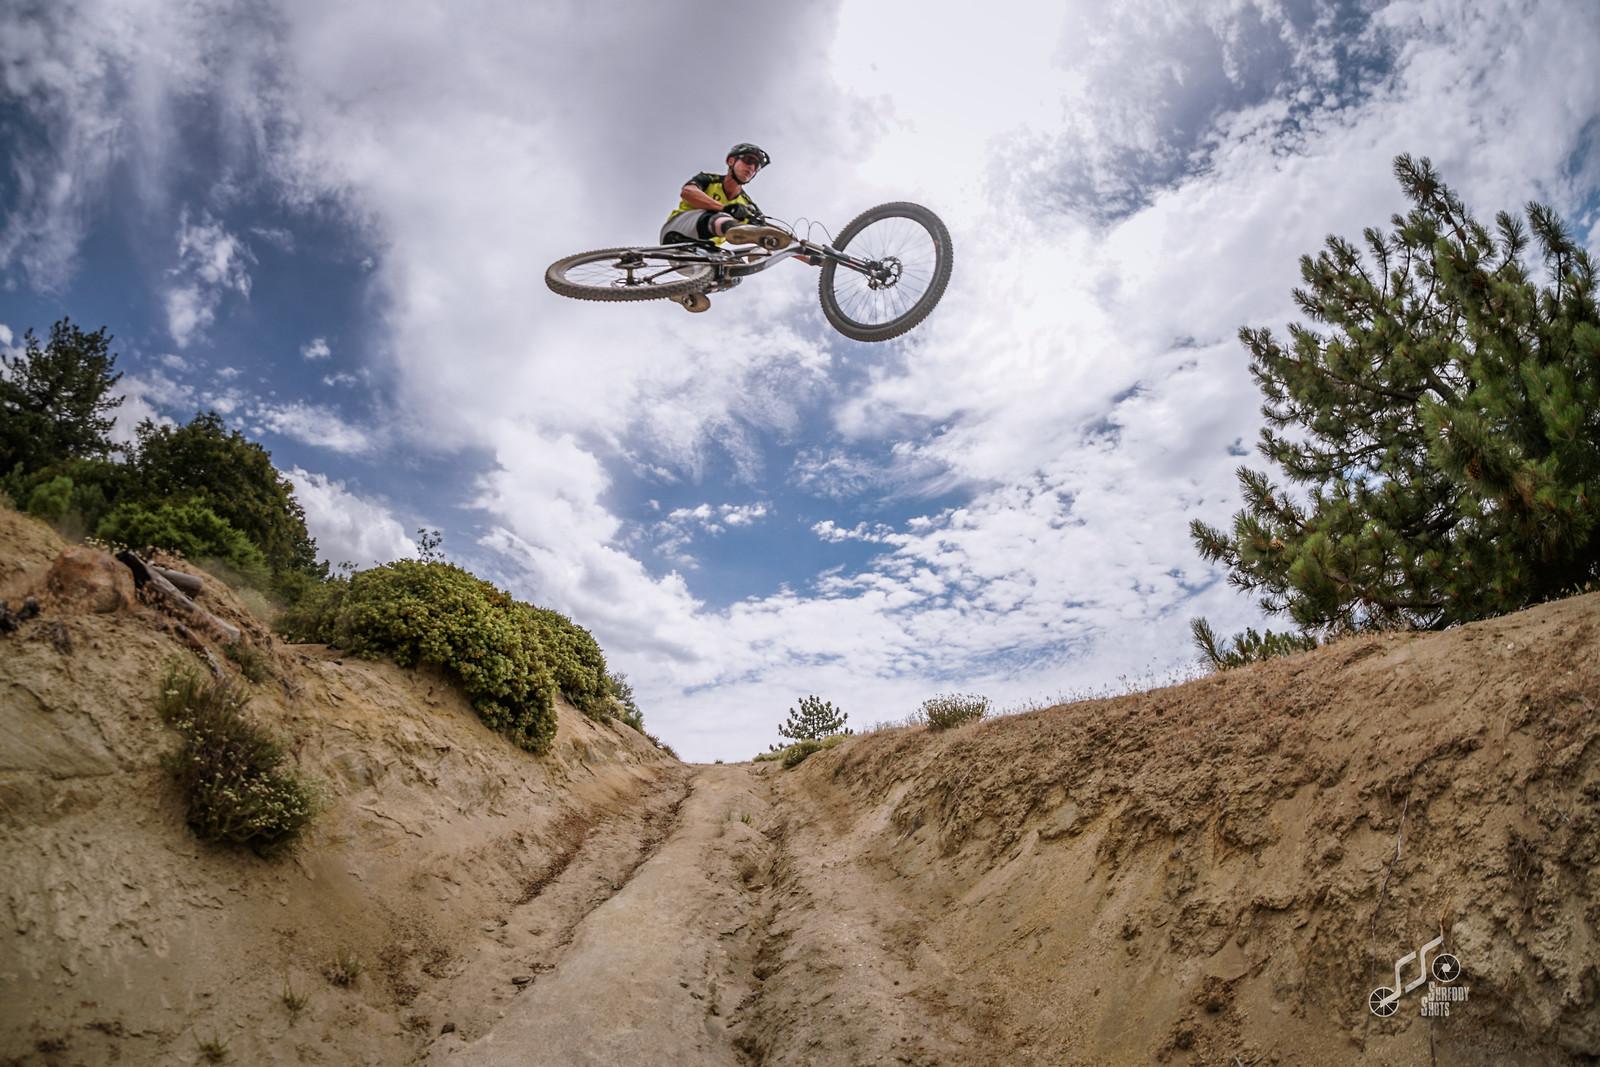 Brian road gap - shreddyshots - Mountain Biking Pictures - Vital MTB